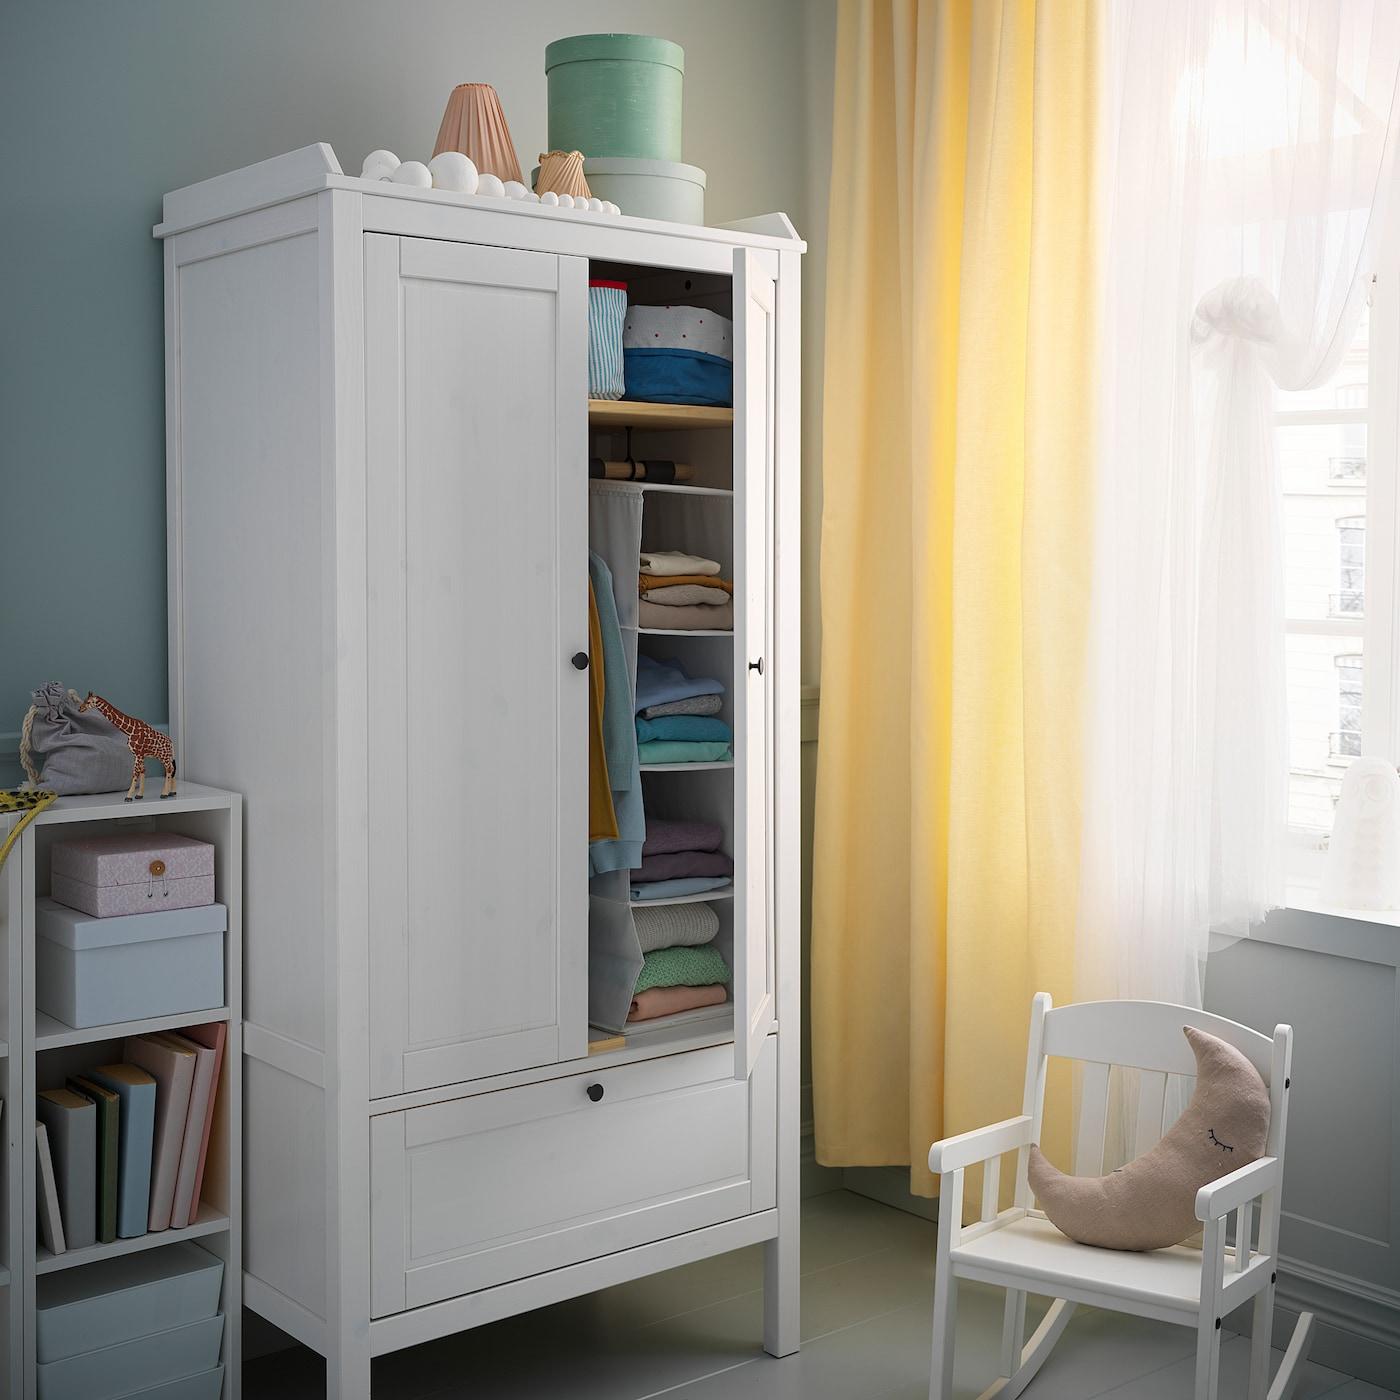 Sundvik Wardrobe White 31 1 2x19 5 8x67 3 8 Ikea